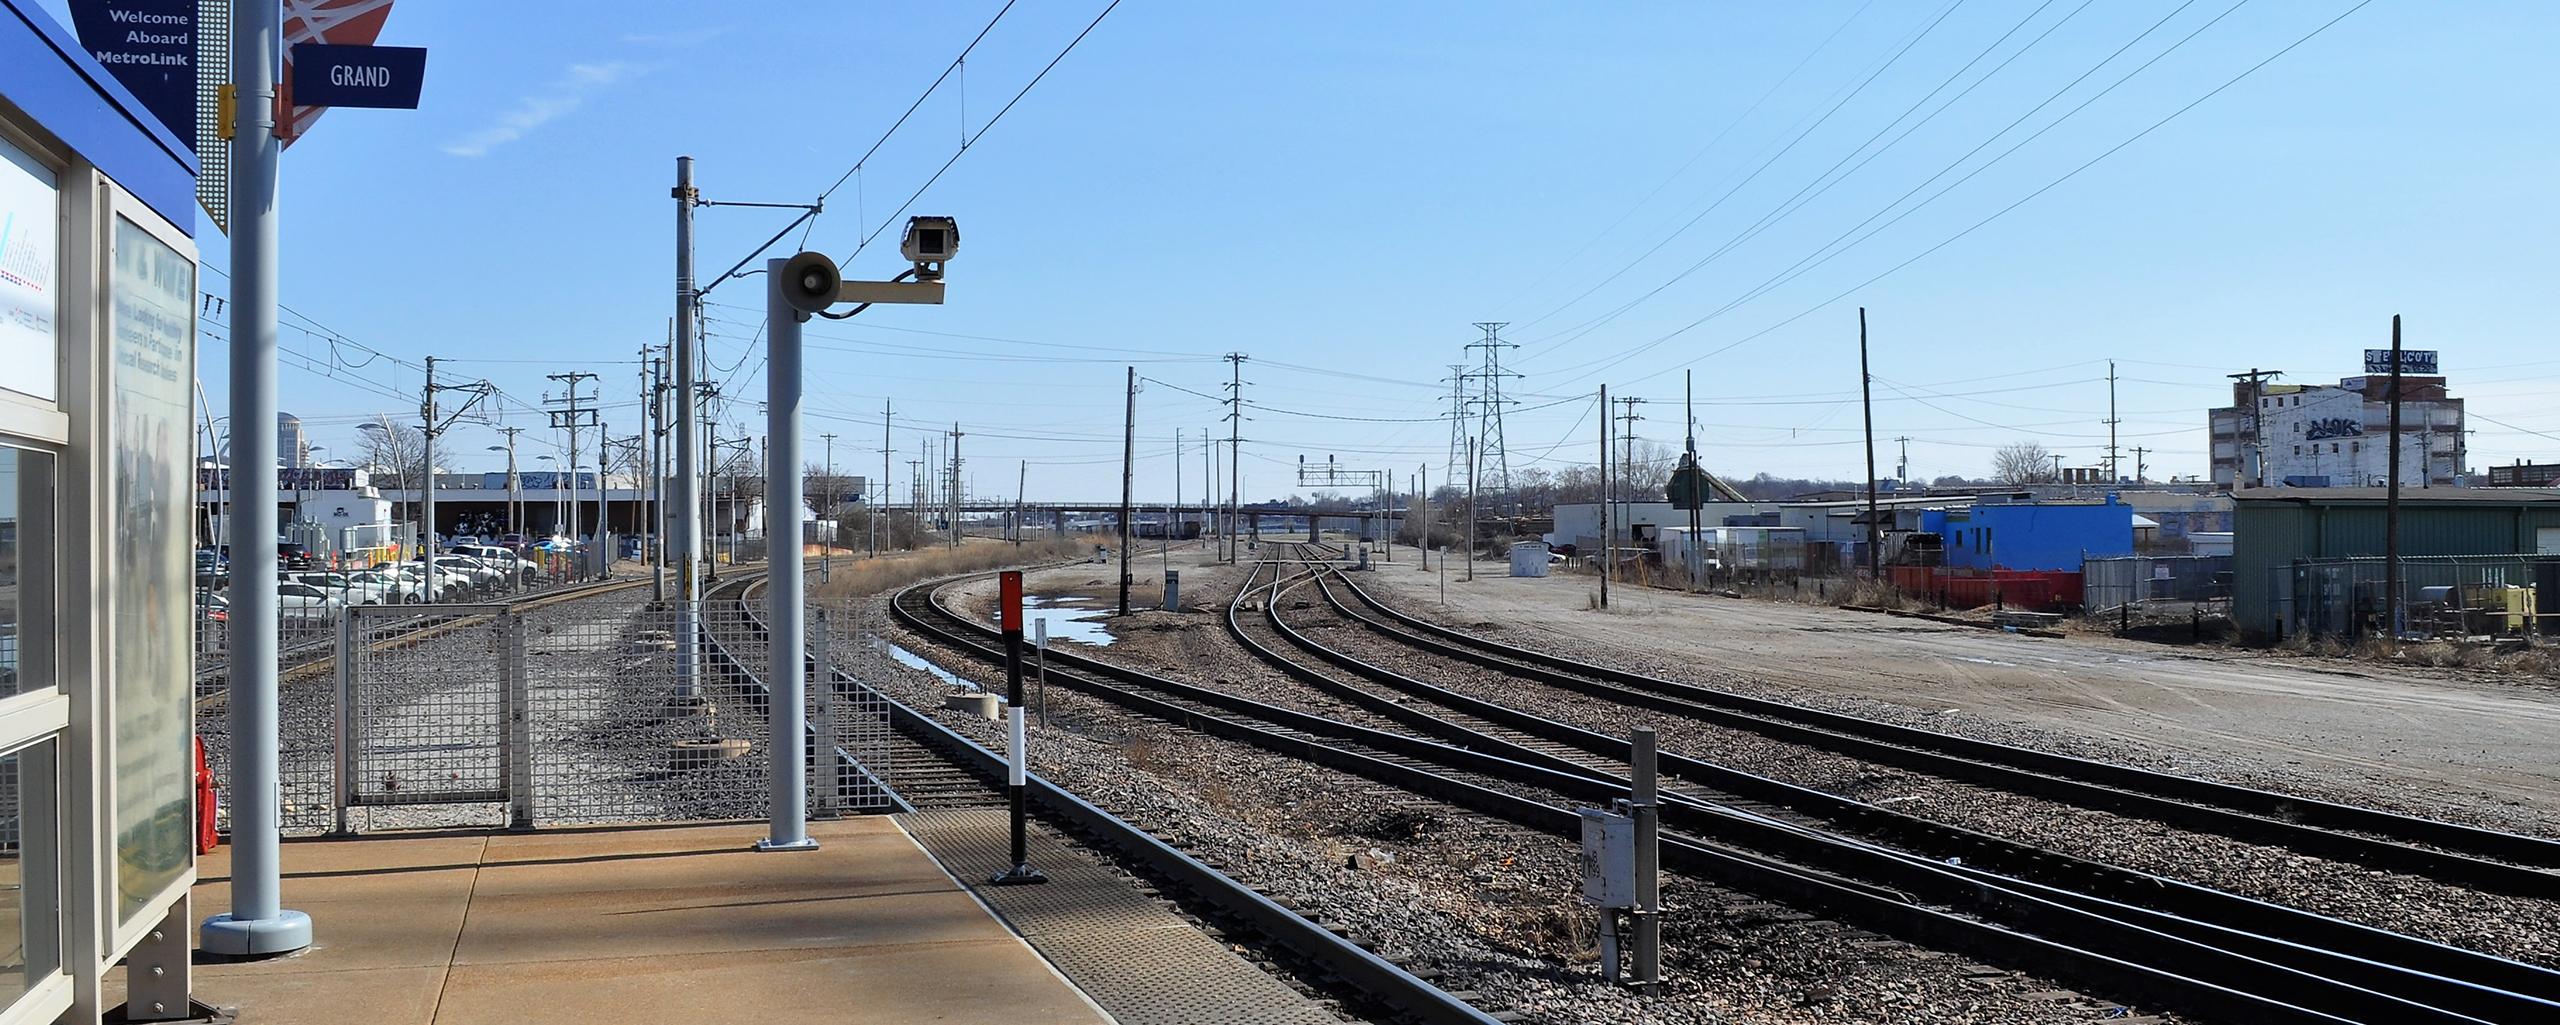 Read More | Grand MetroLink Station tracks